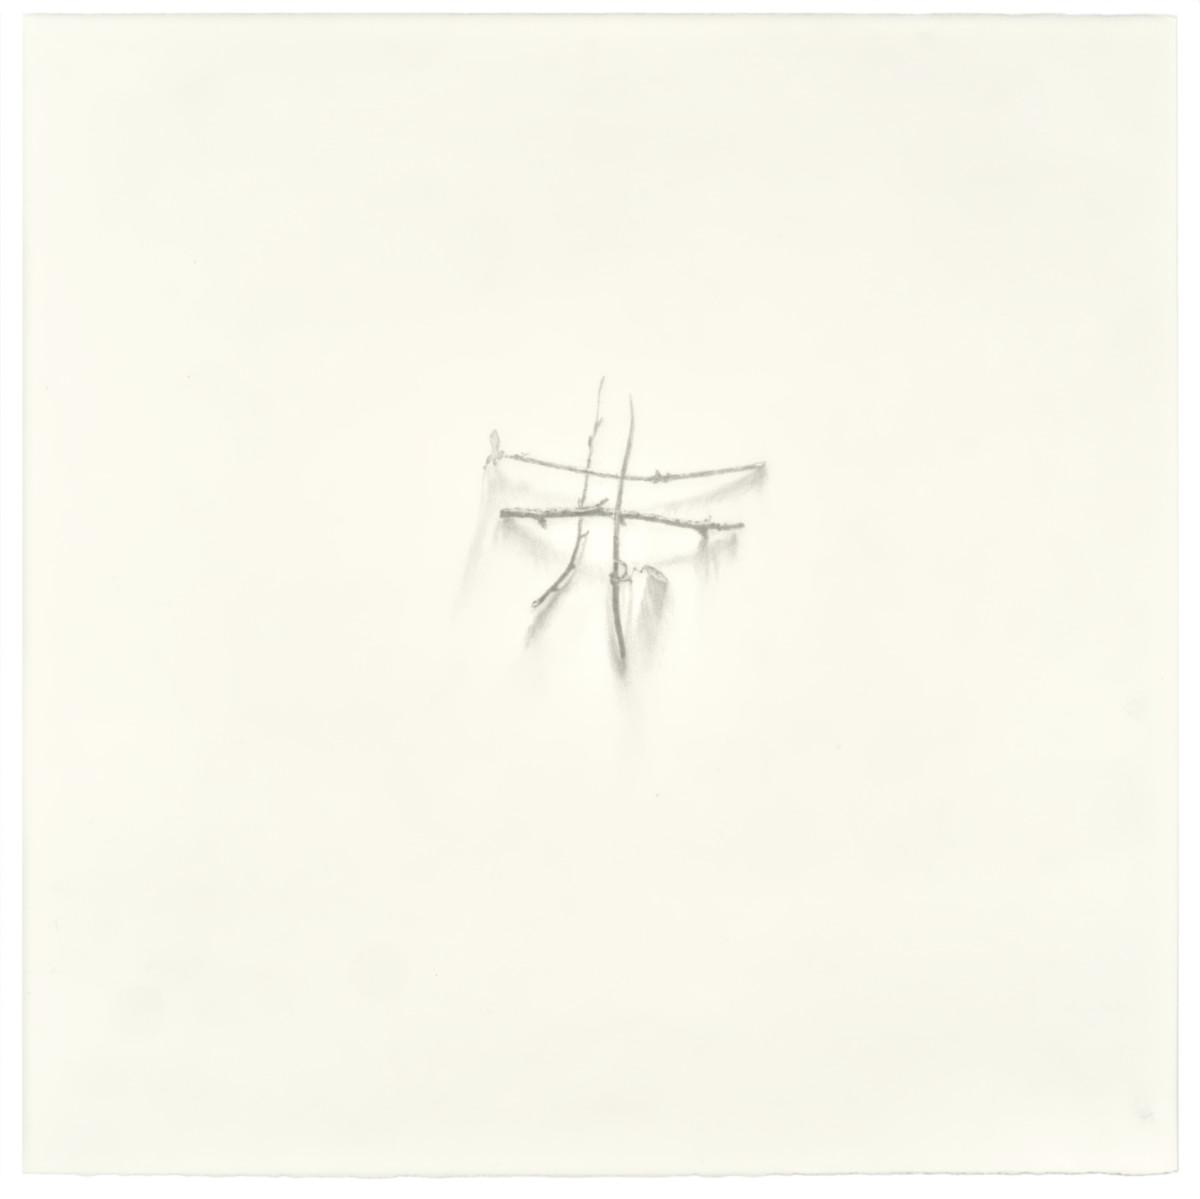 #untitled, 2019, graphite on paper, 55 x 55cm